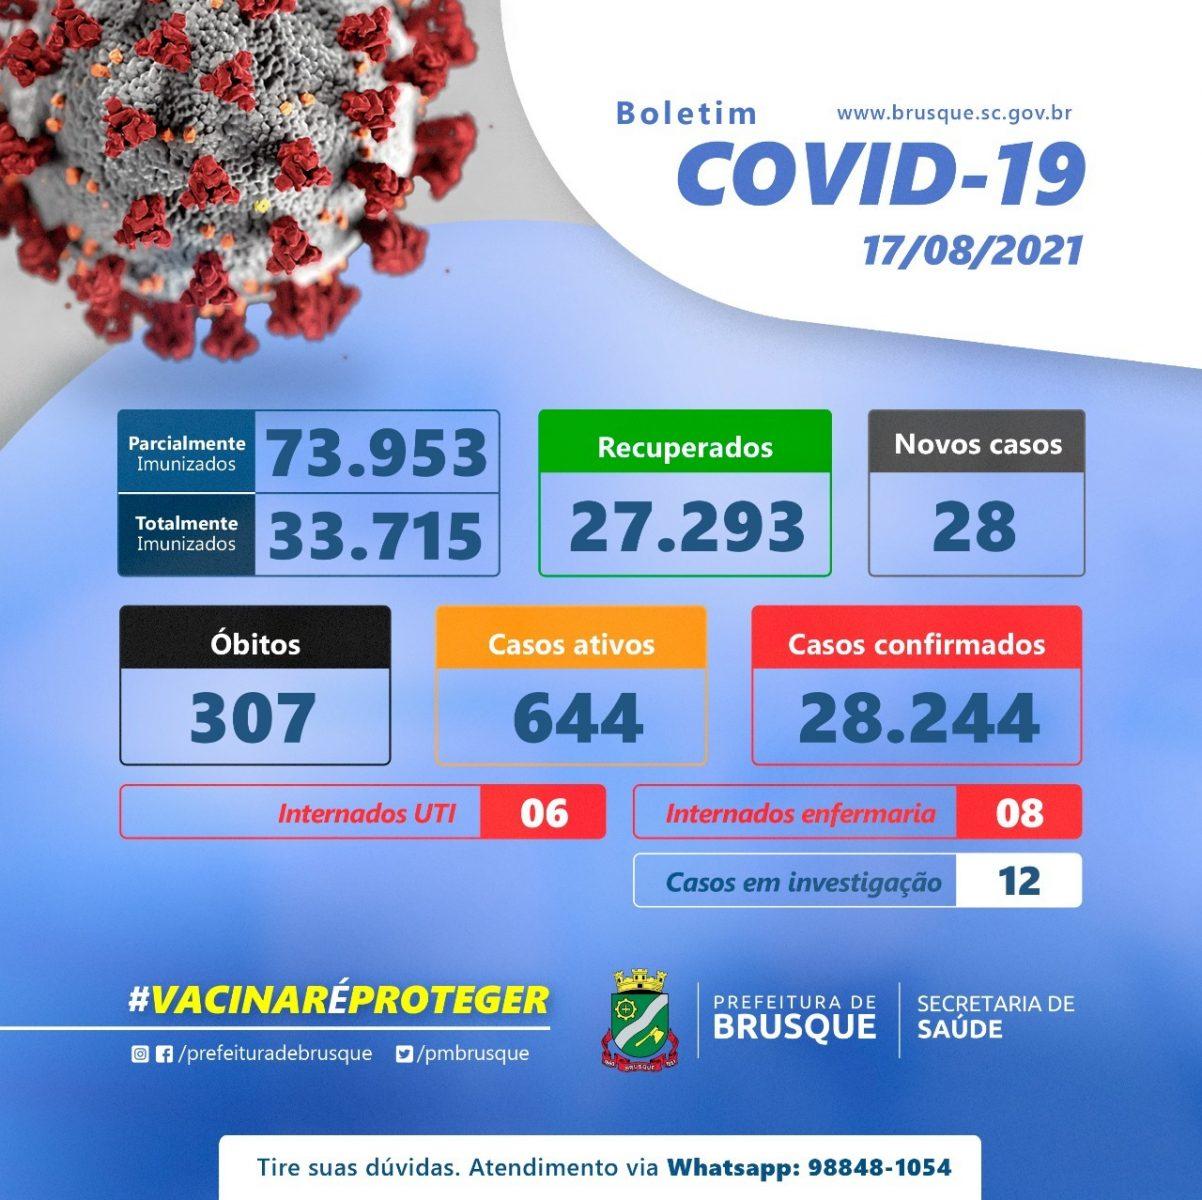 Covid-19: Confira o boletim epidemiológico desta terça-feira (17)